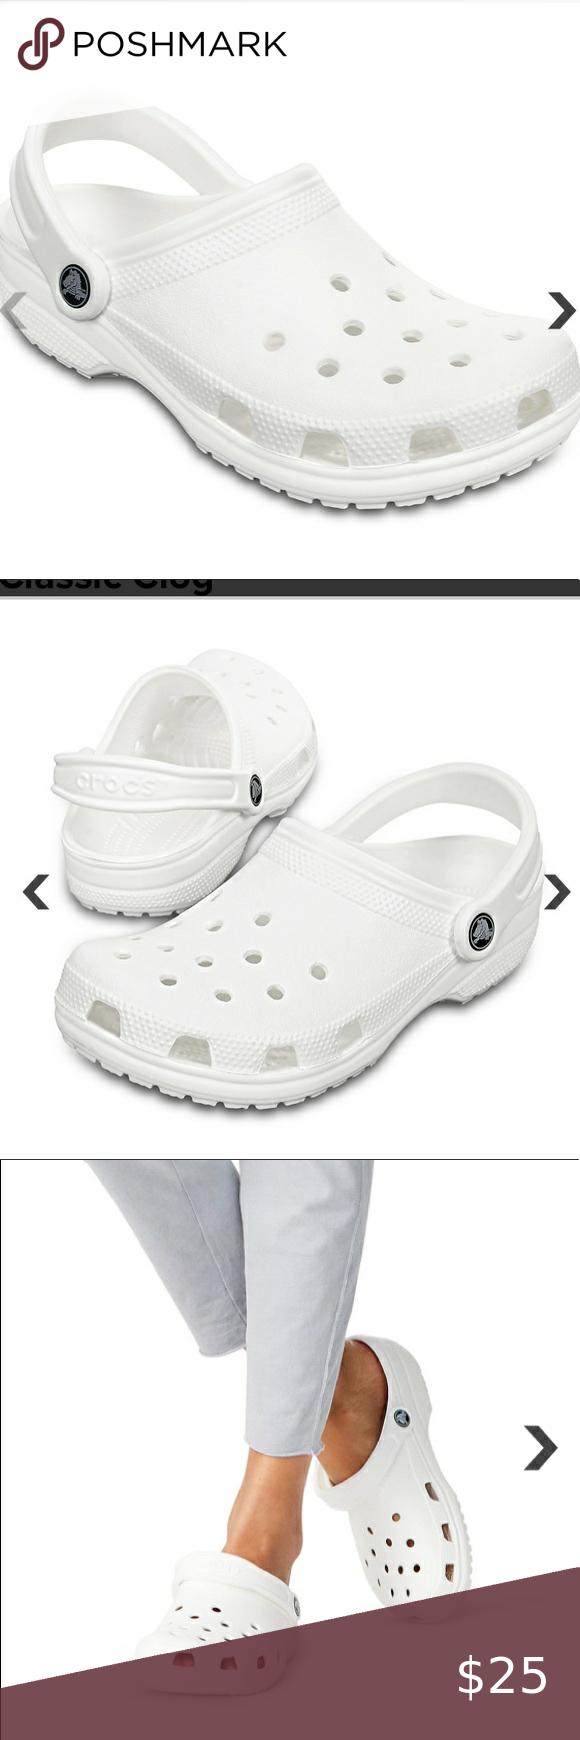 white crocs -white crocs -few marks but